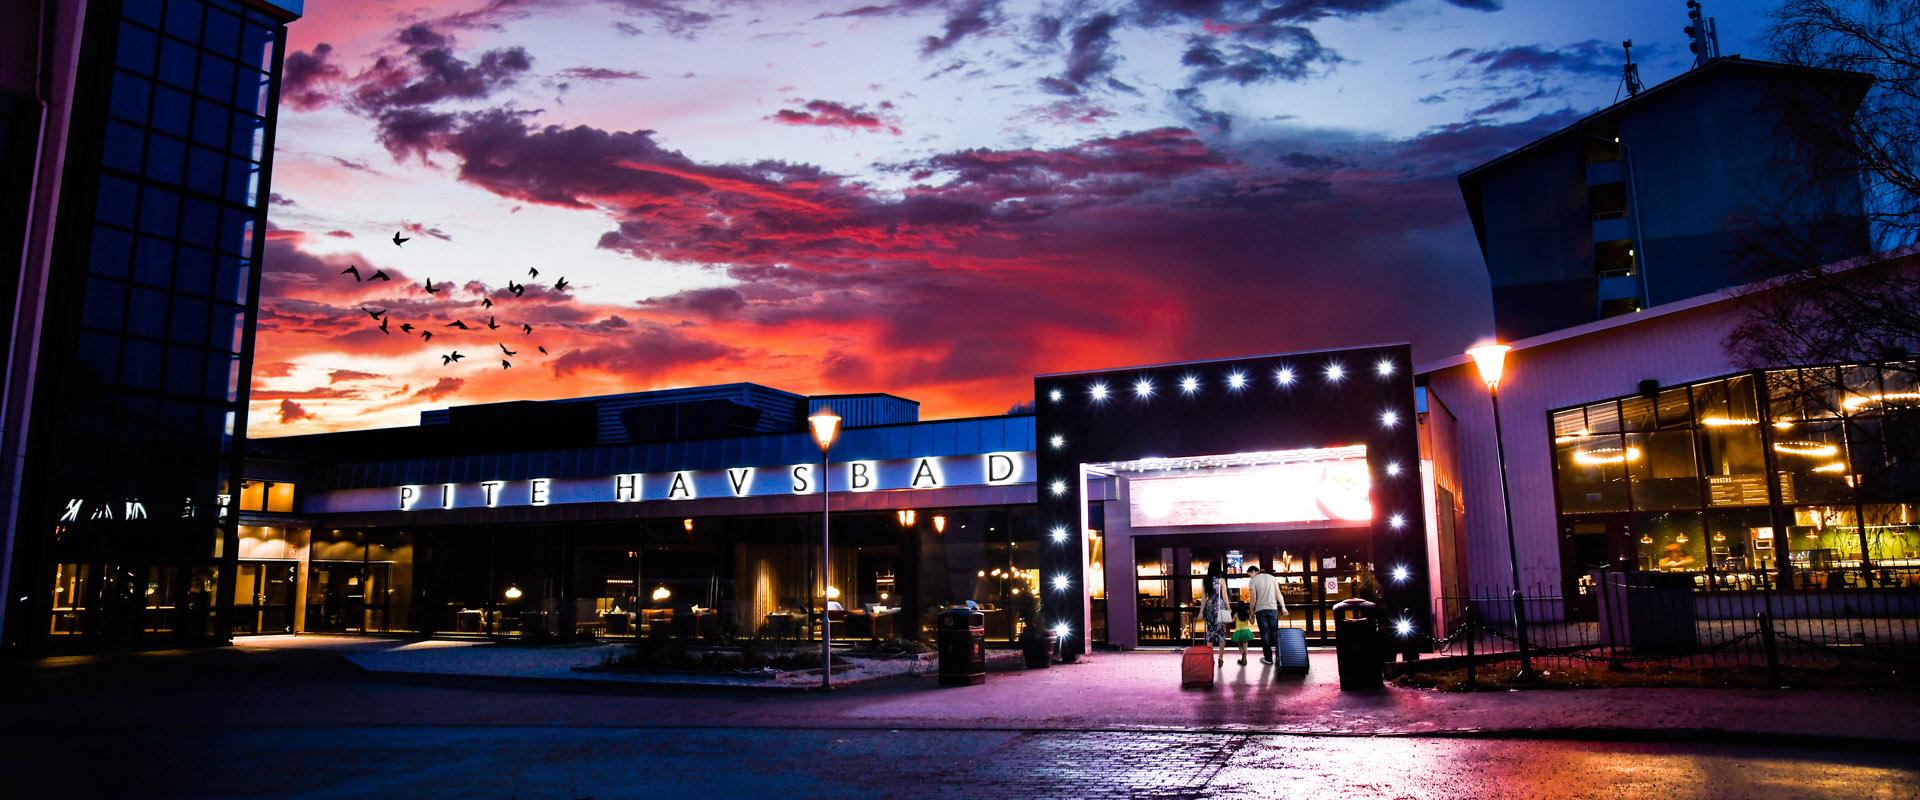 Pite Havsbad Entré i solnedgång